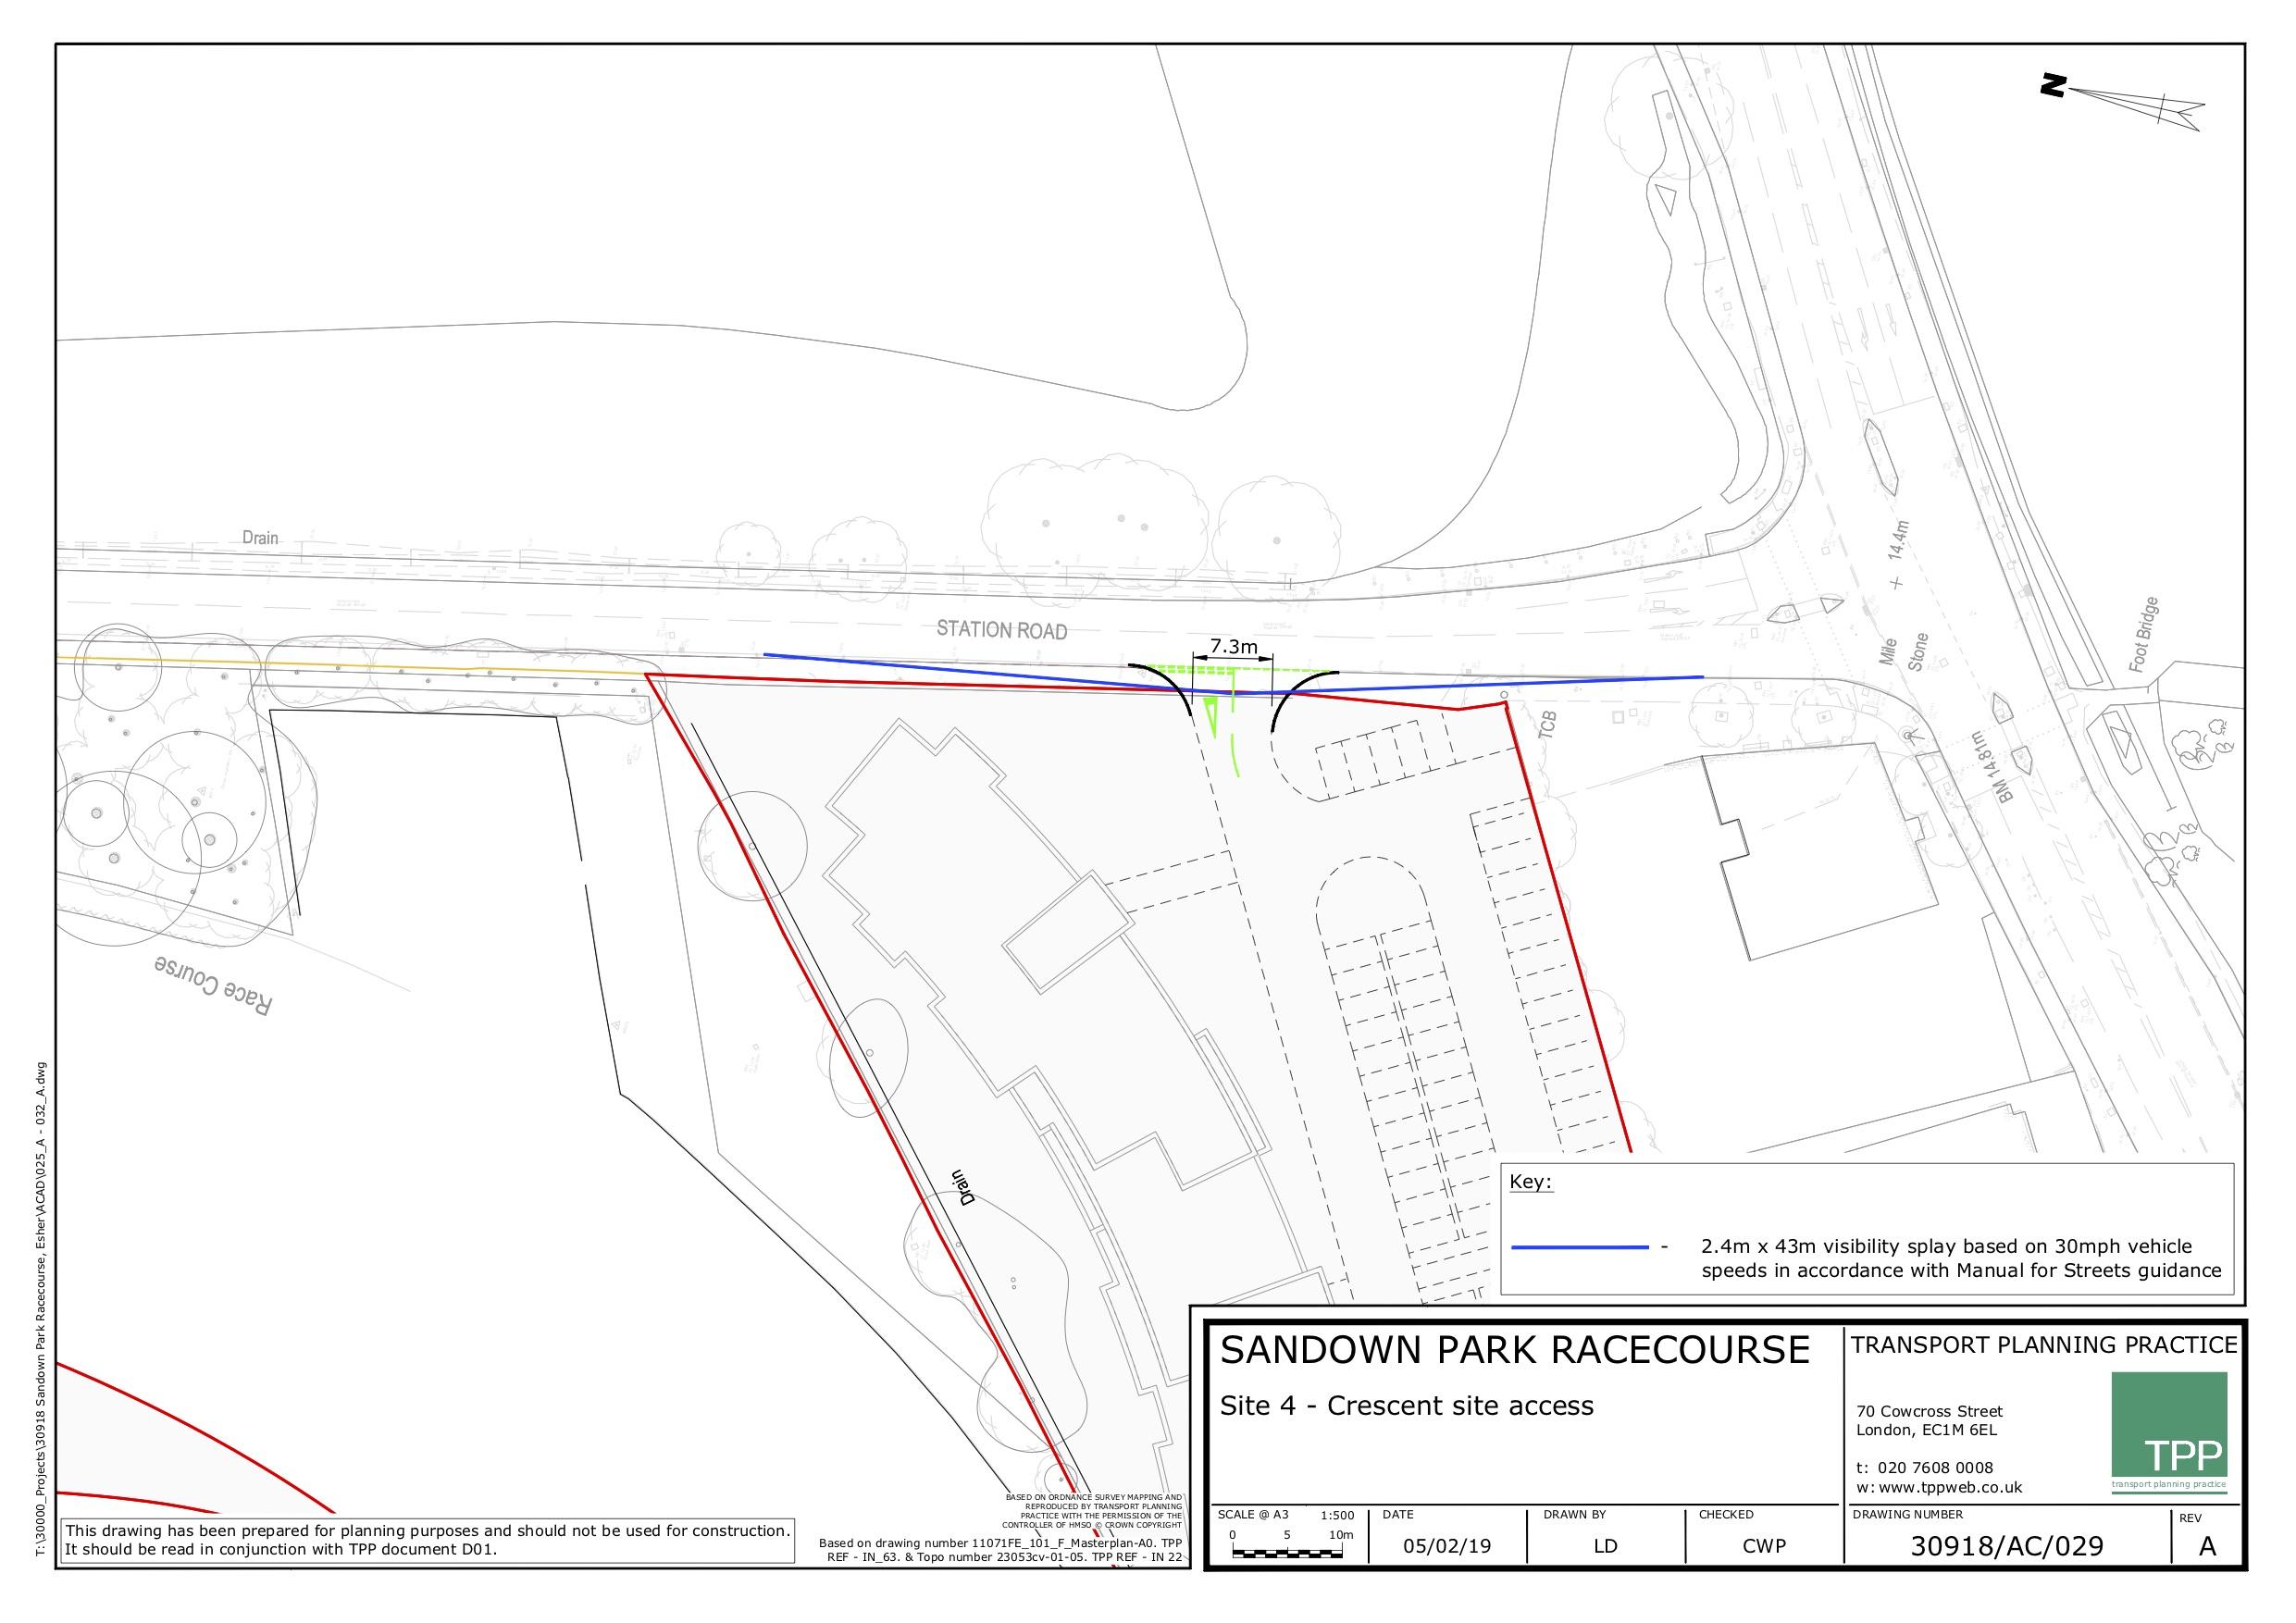 site 4 access plans.jpg